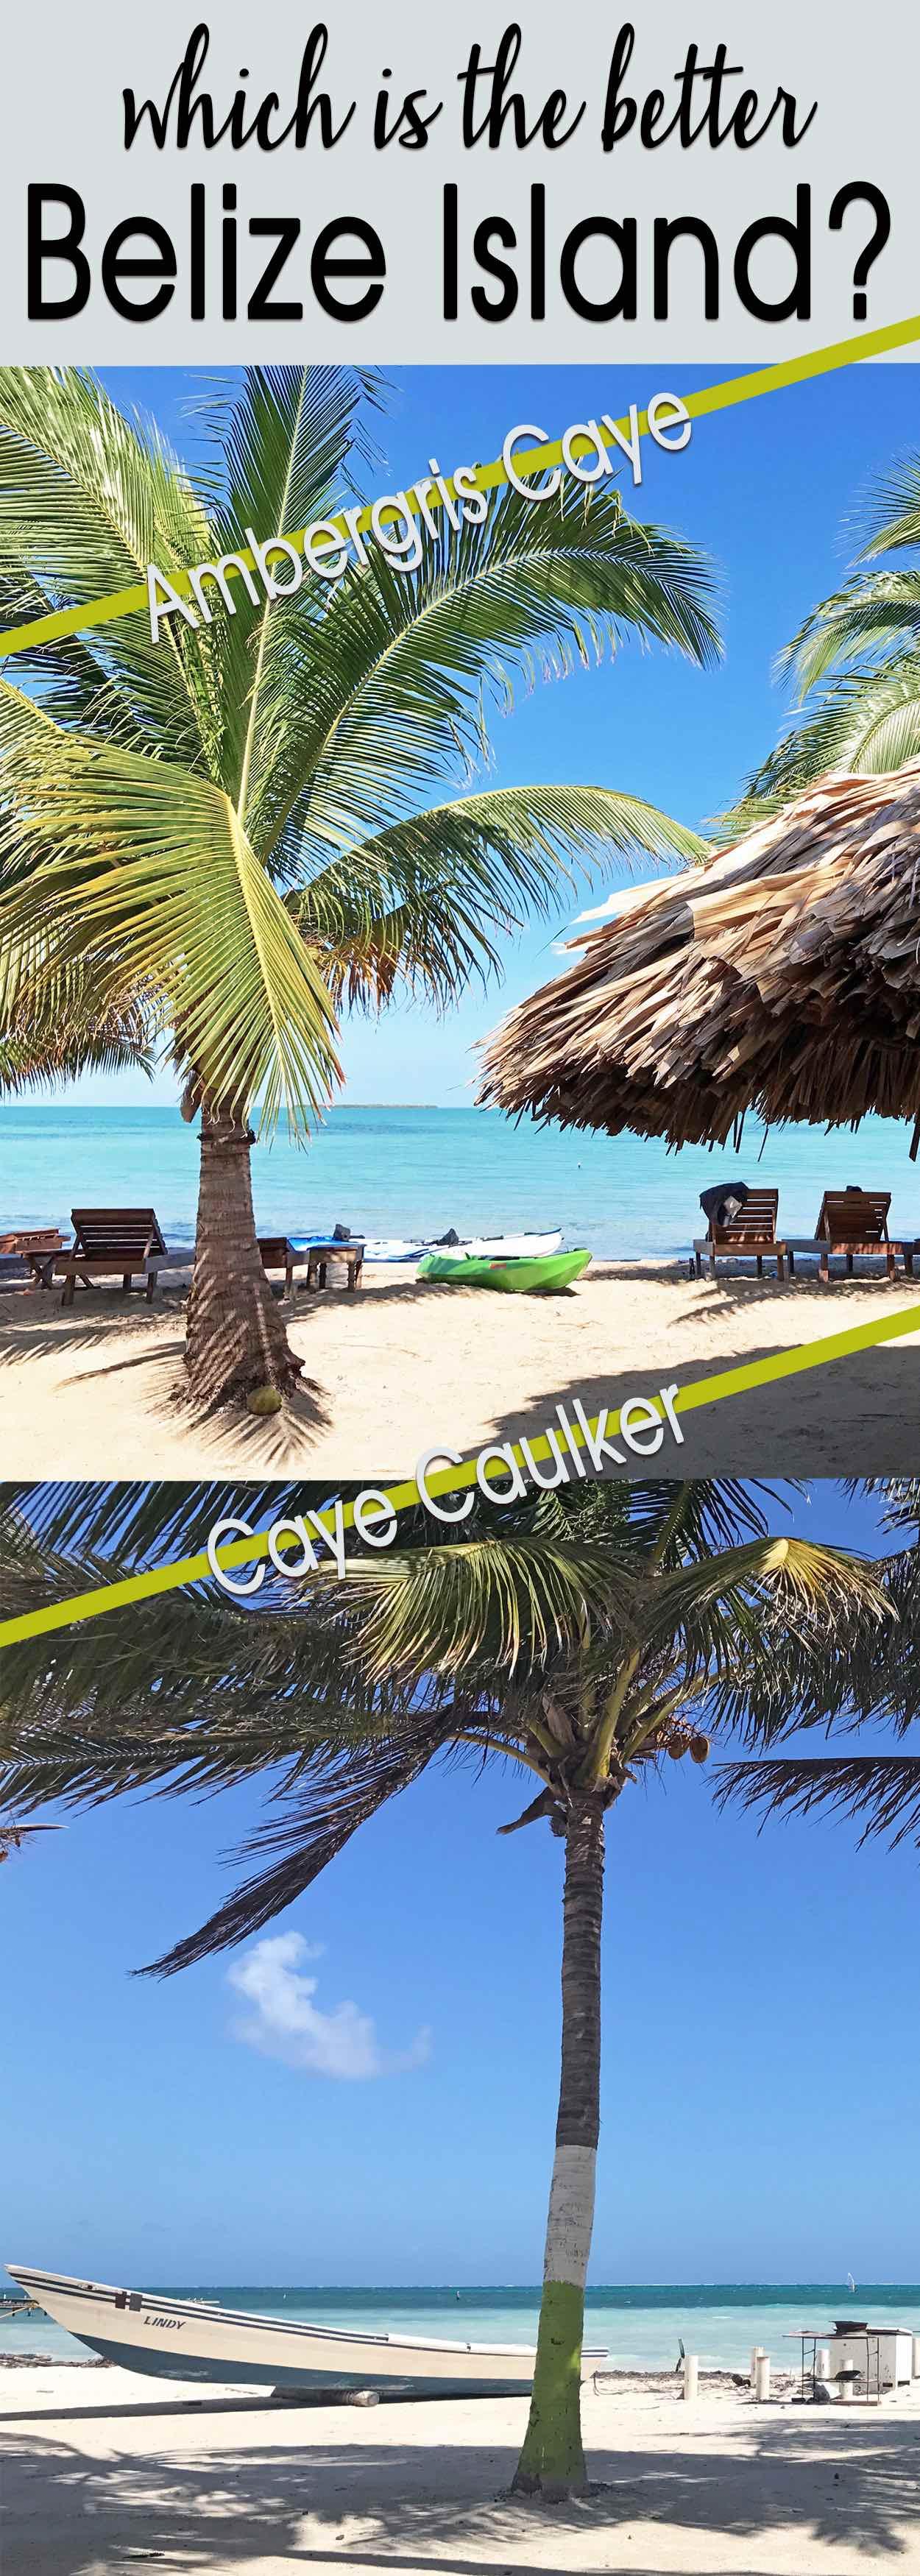 Ambergris Caye vs Caulker Caulker | Which Belize island is better?